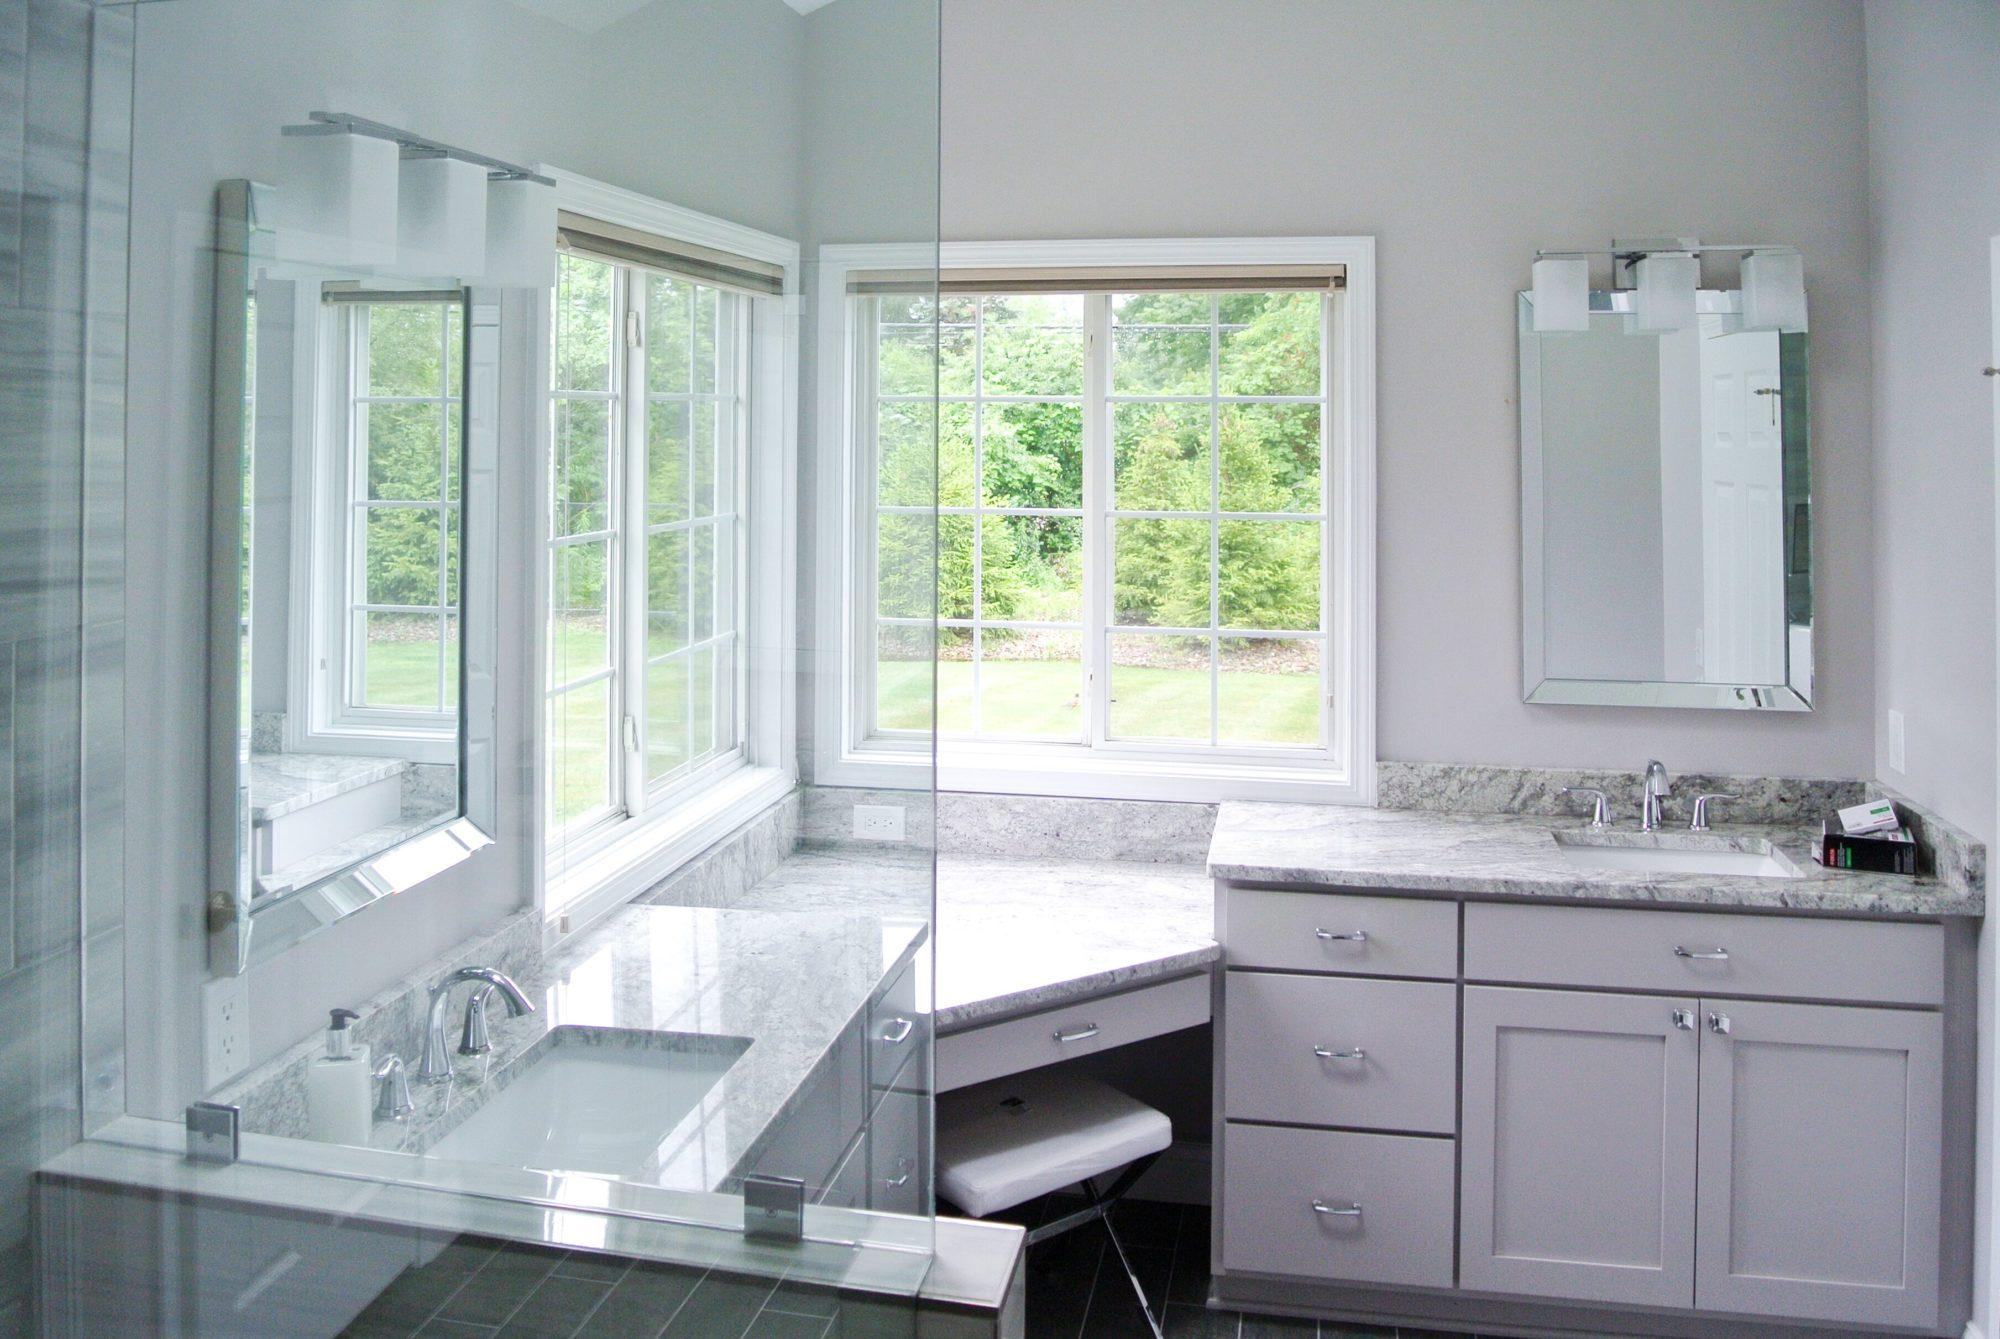 Vanity and Sink Renovation